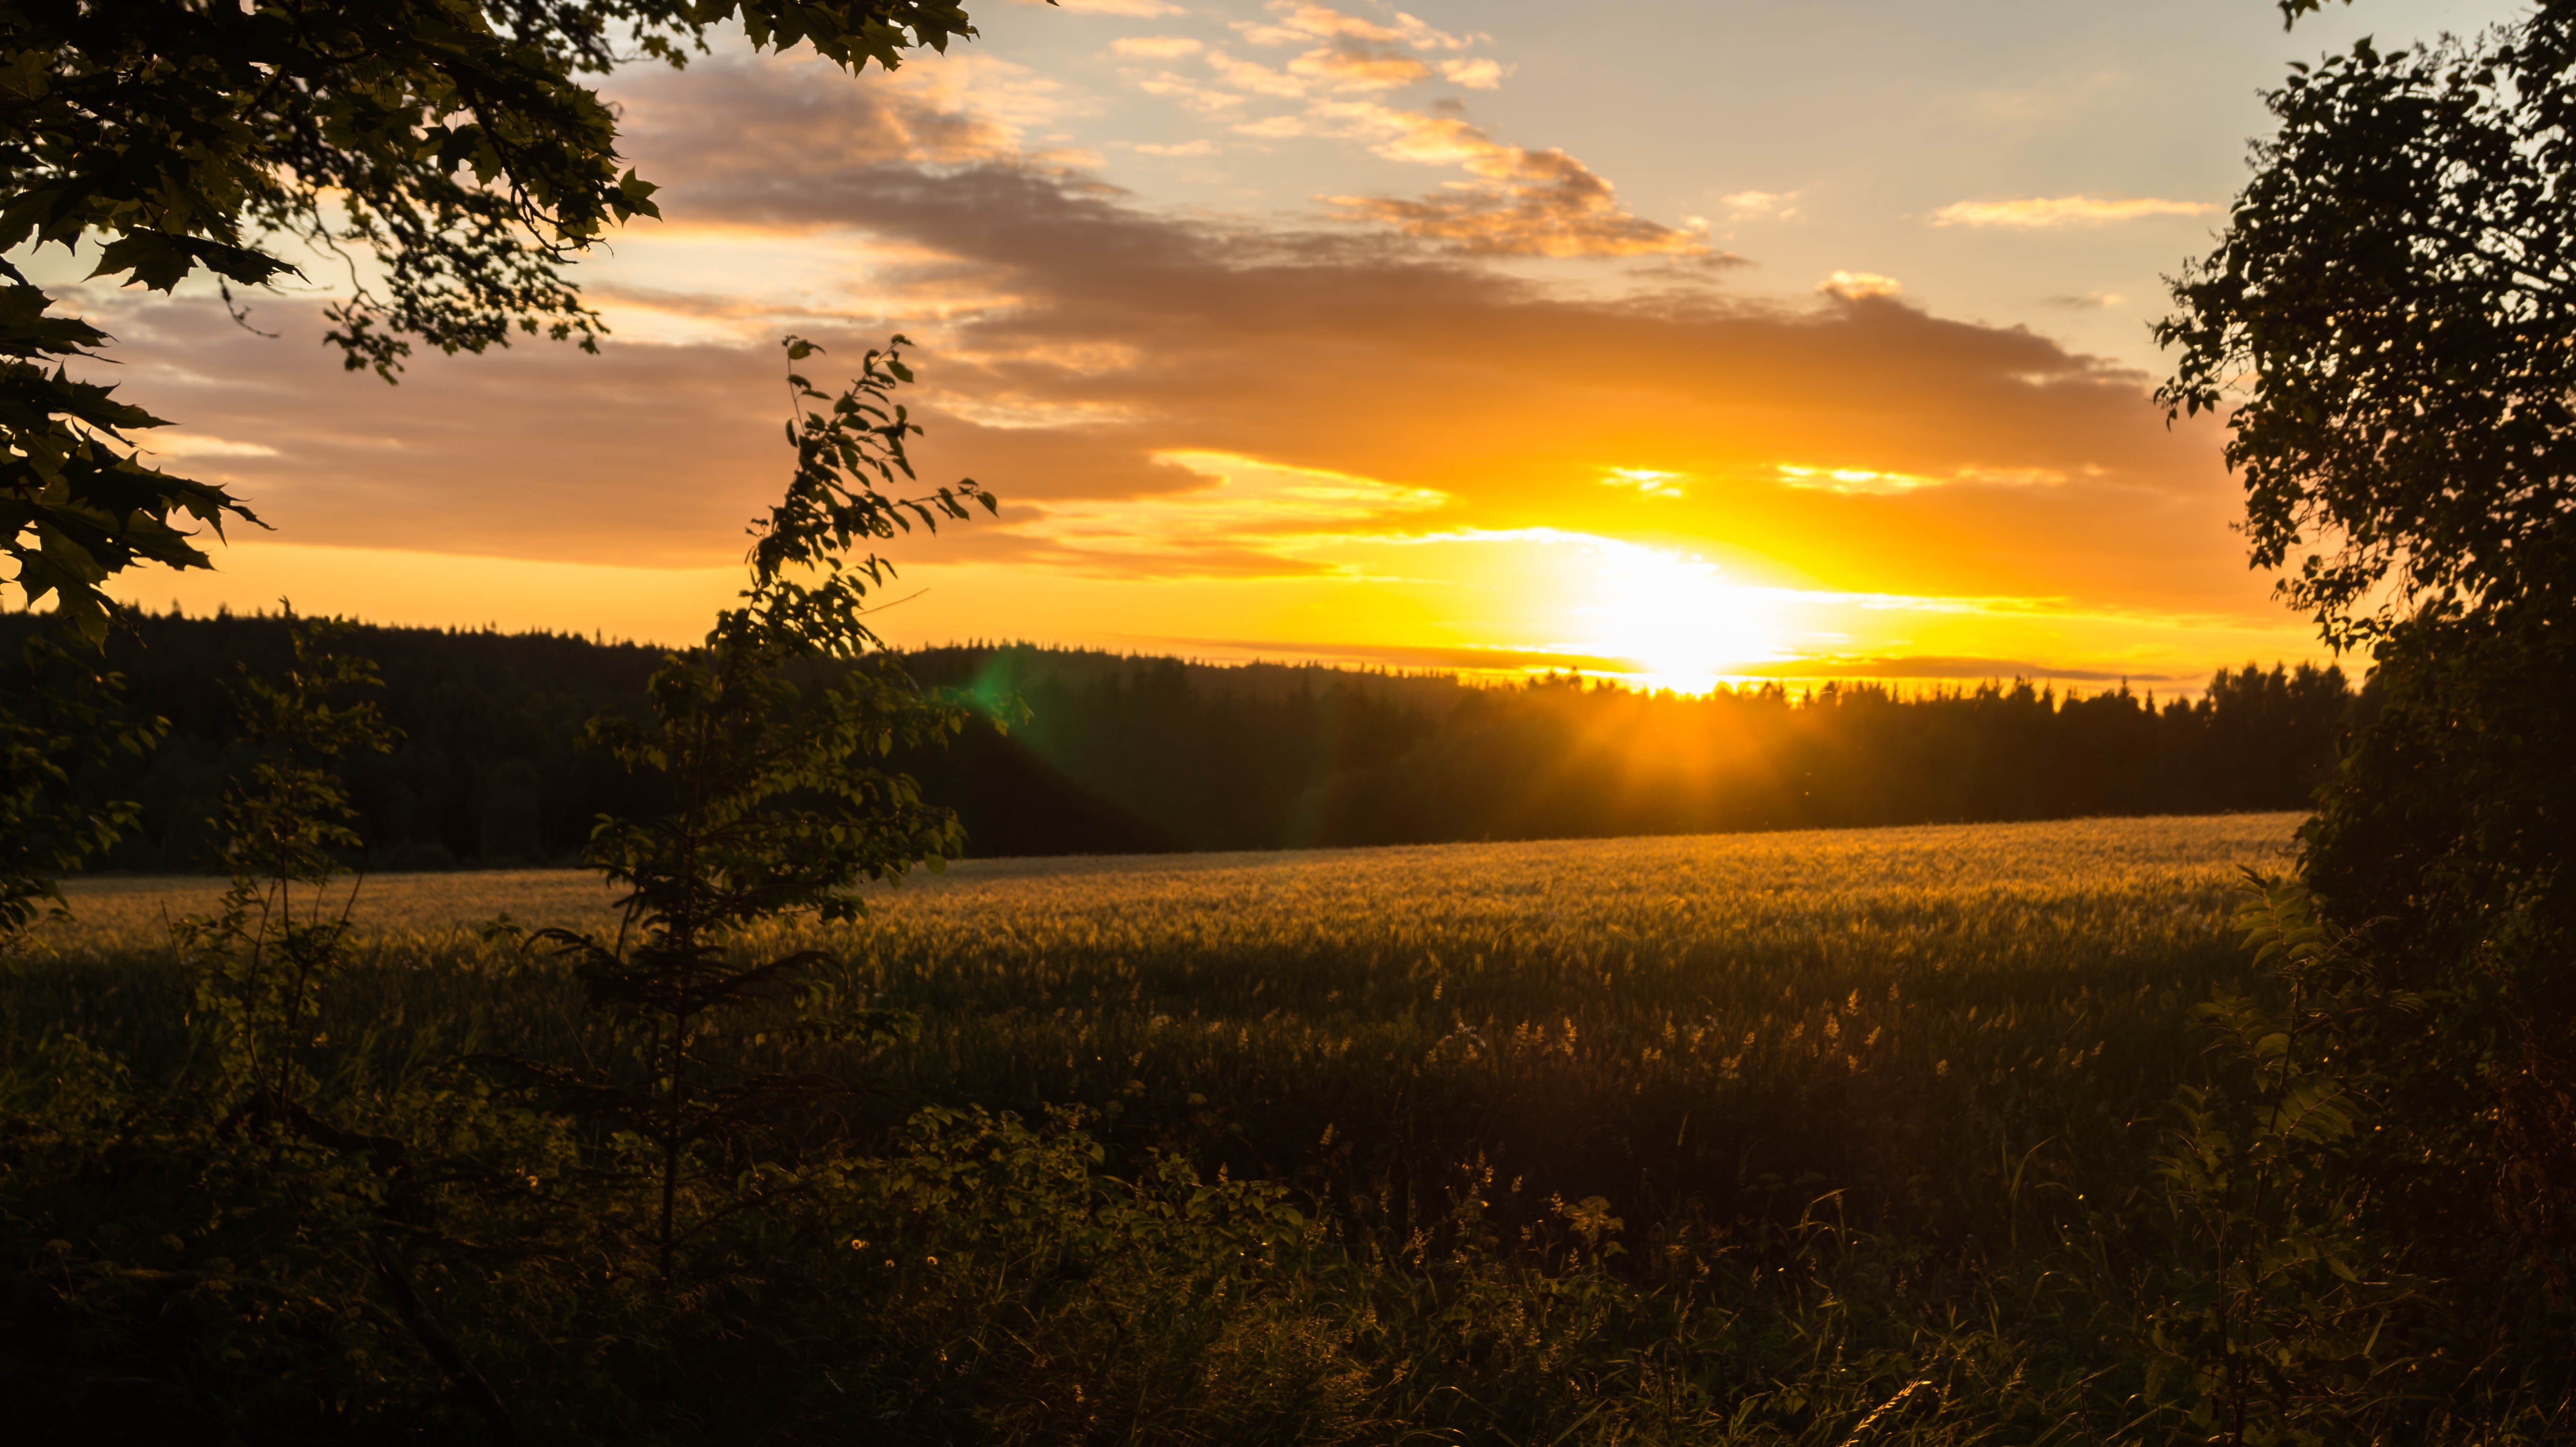 Hd Wallpapers For Mobile: Sunset, Landscape, Field, Sweden HD Wallpapers / Desktop